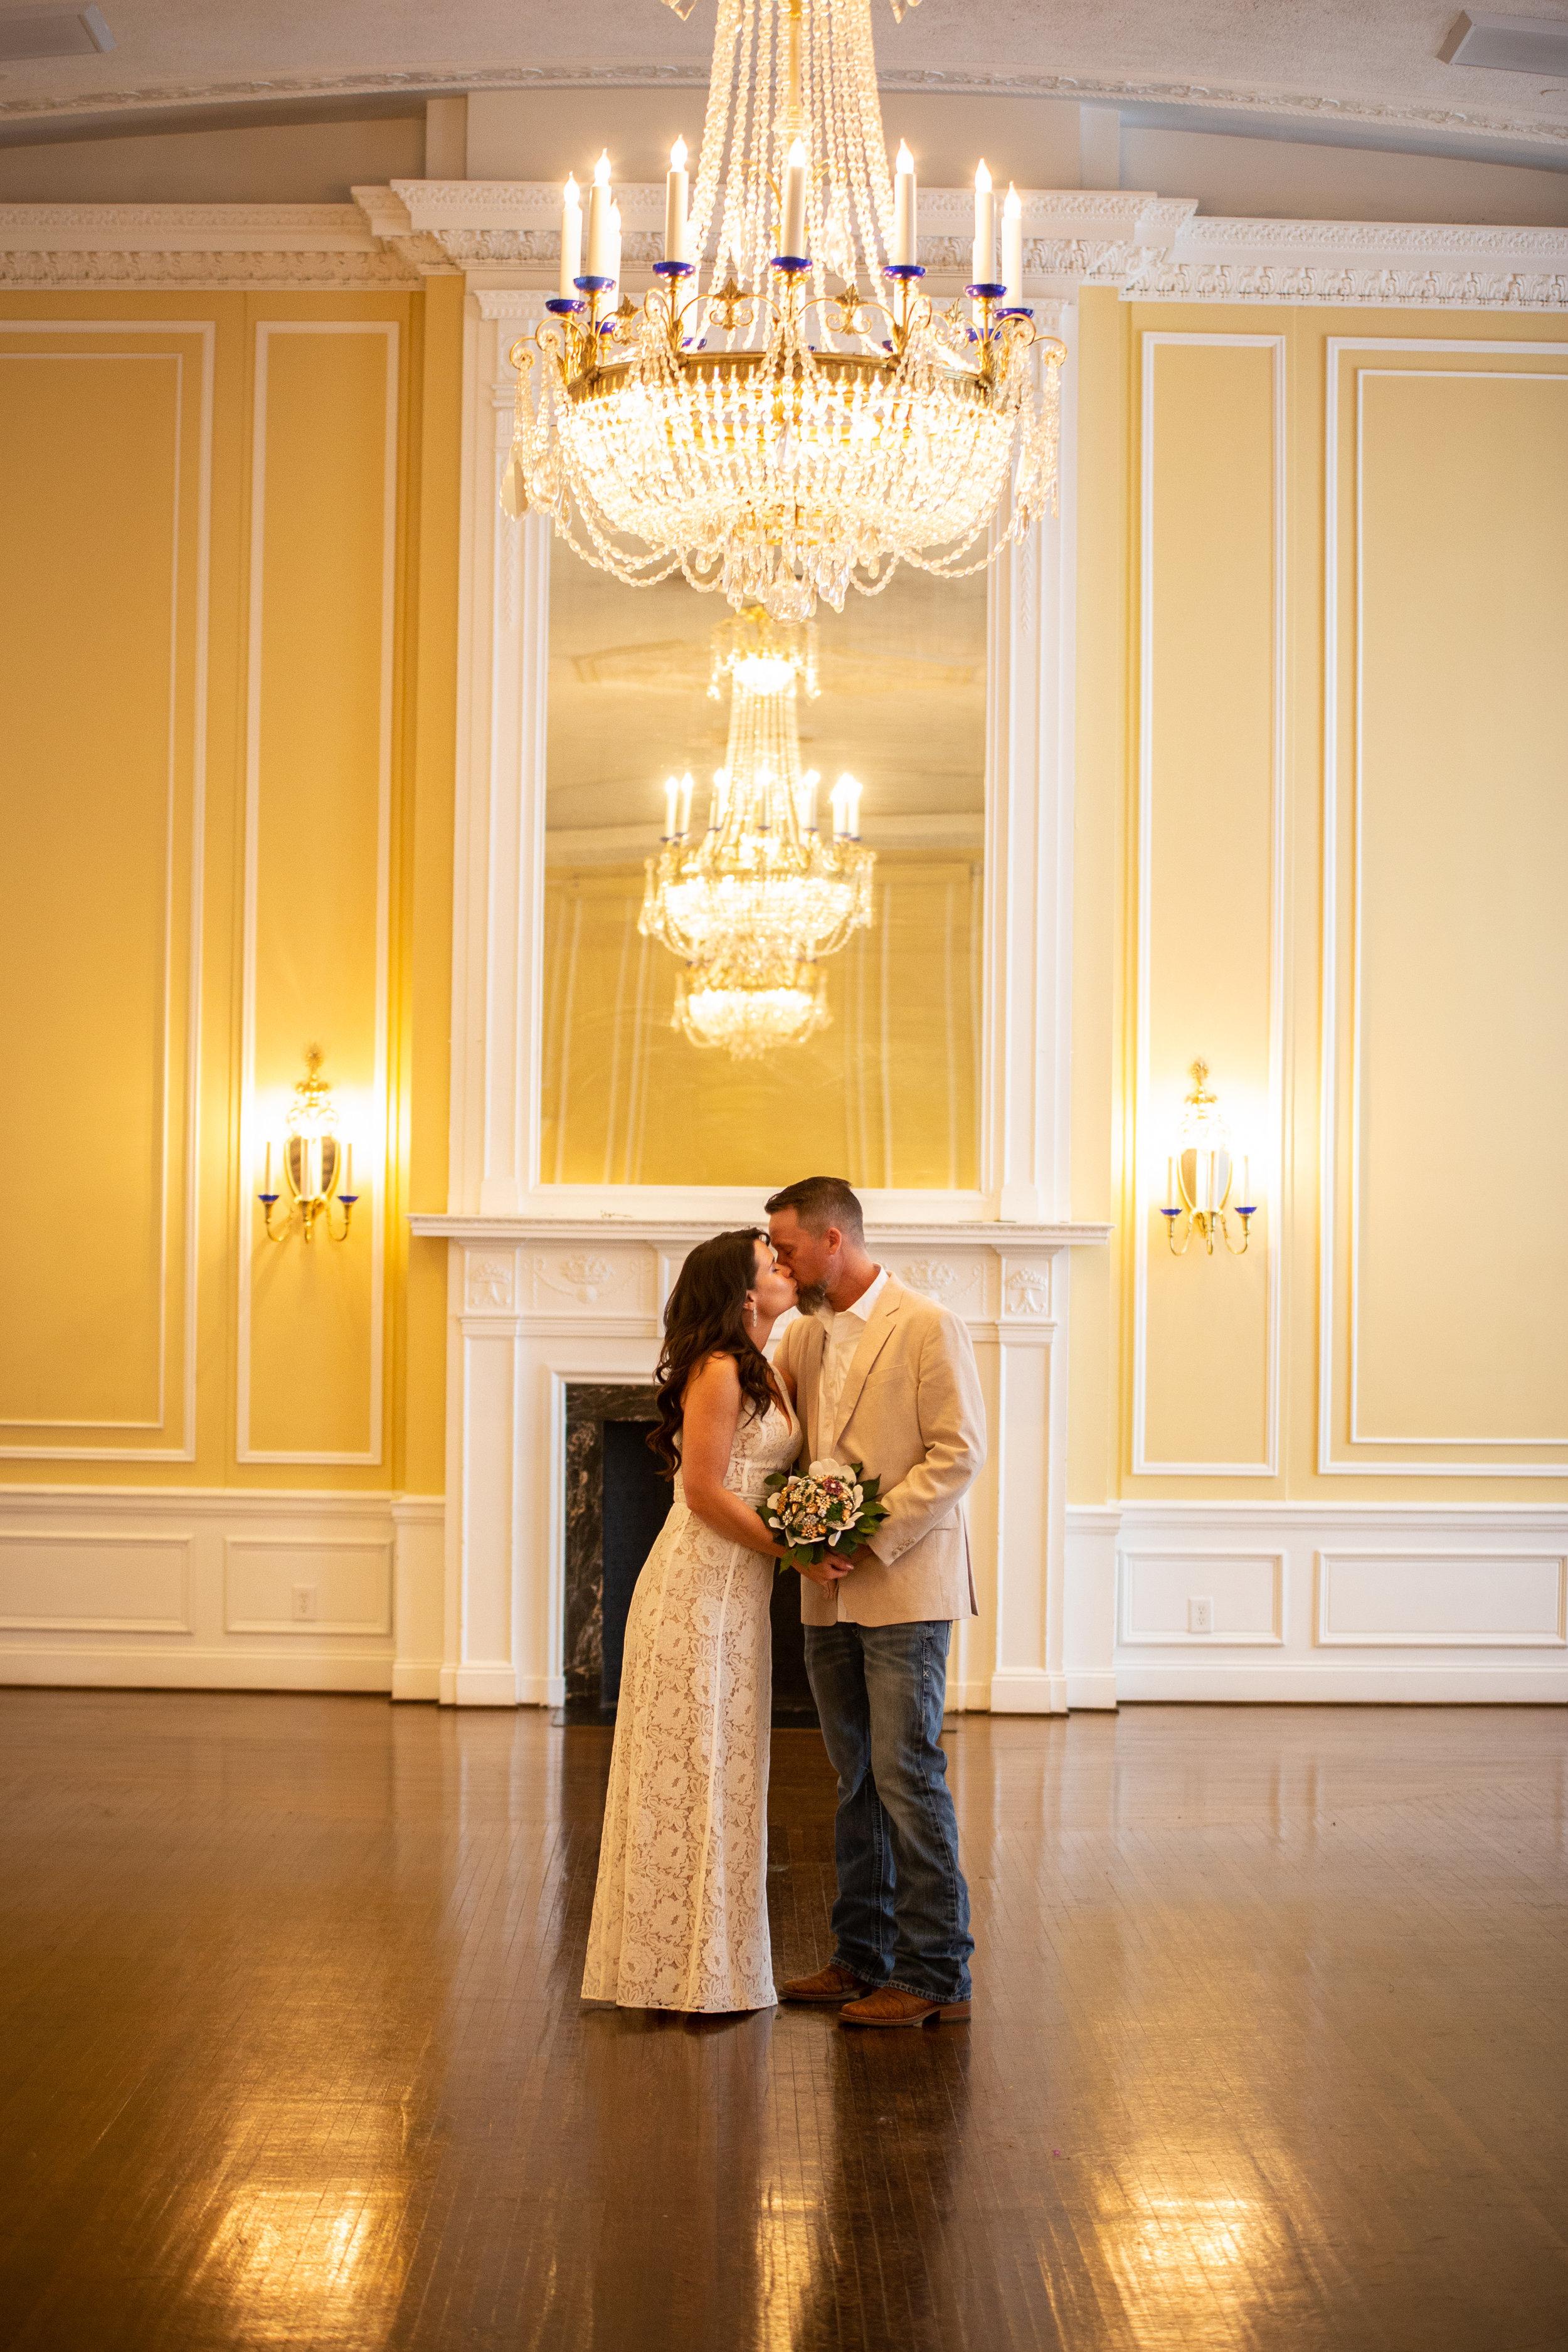 Yellow-Ballroom-Roanoke-Patrick-Henry-Downtown-chandelier-mantle-wood-floors